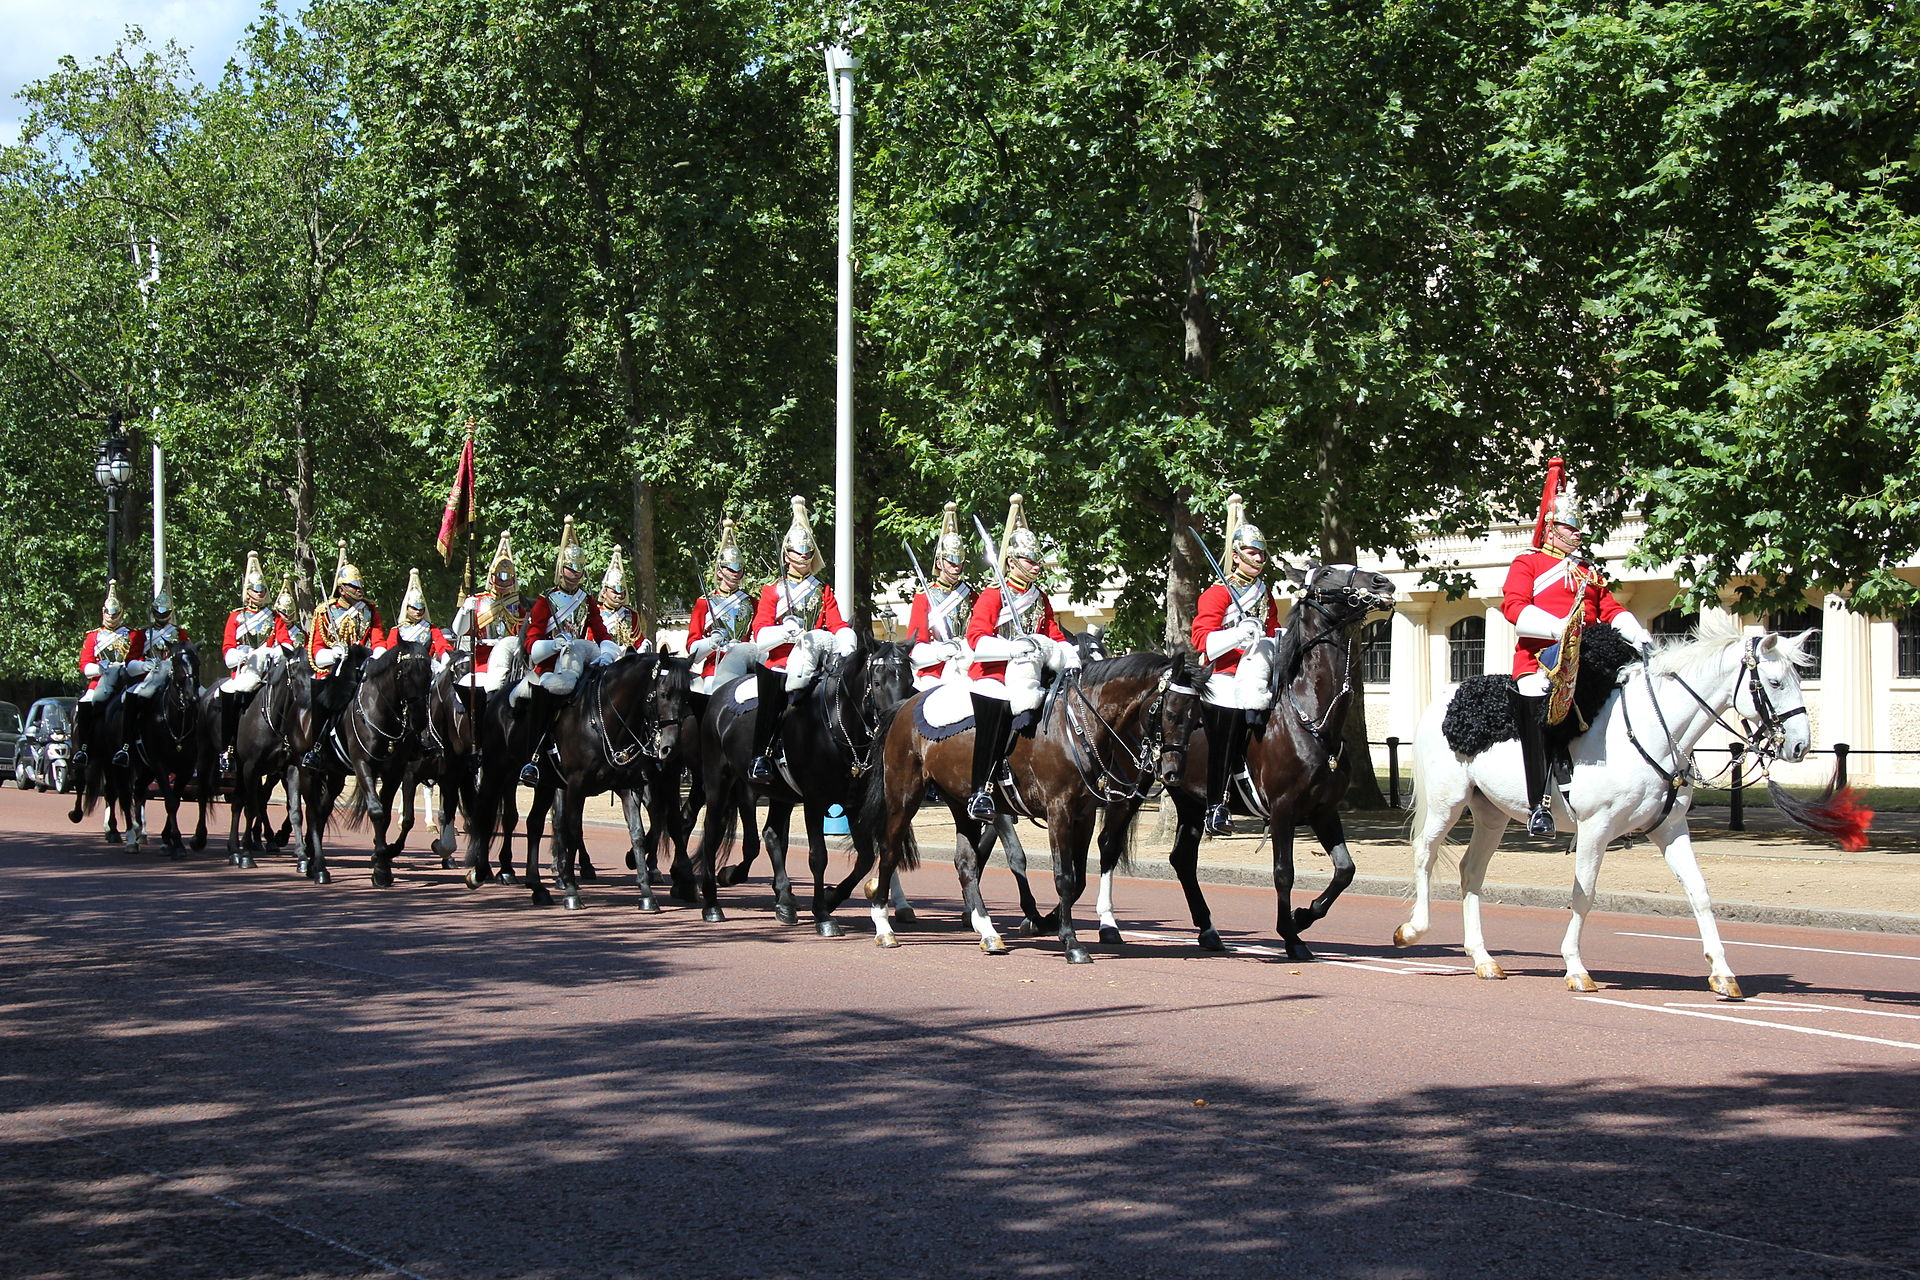 Queen's Guard - Wikipedia